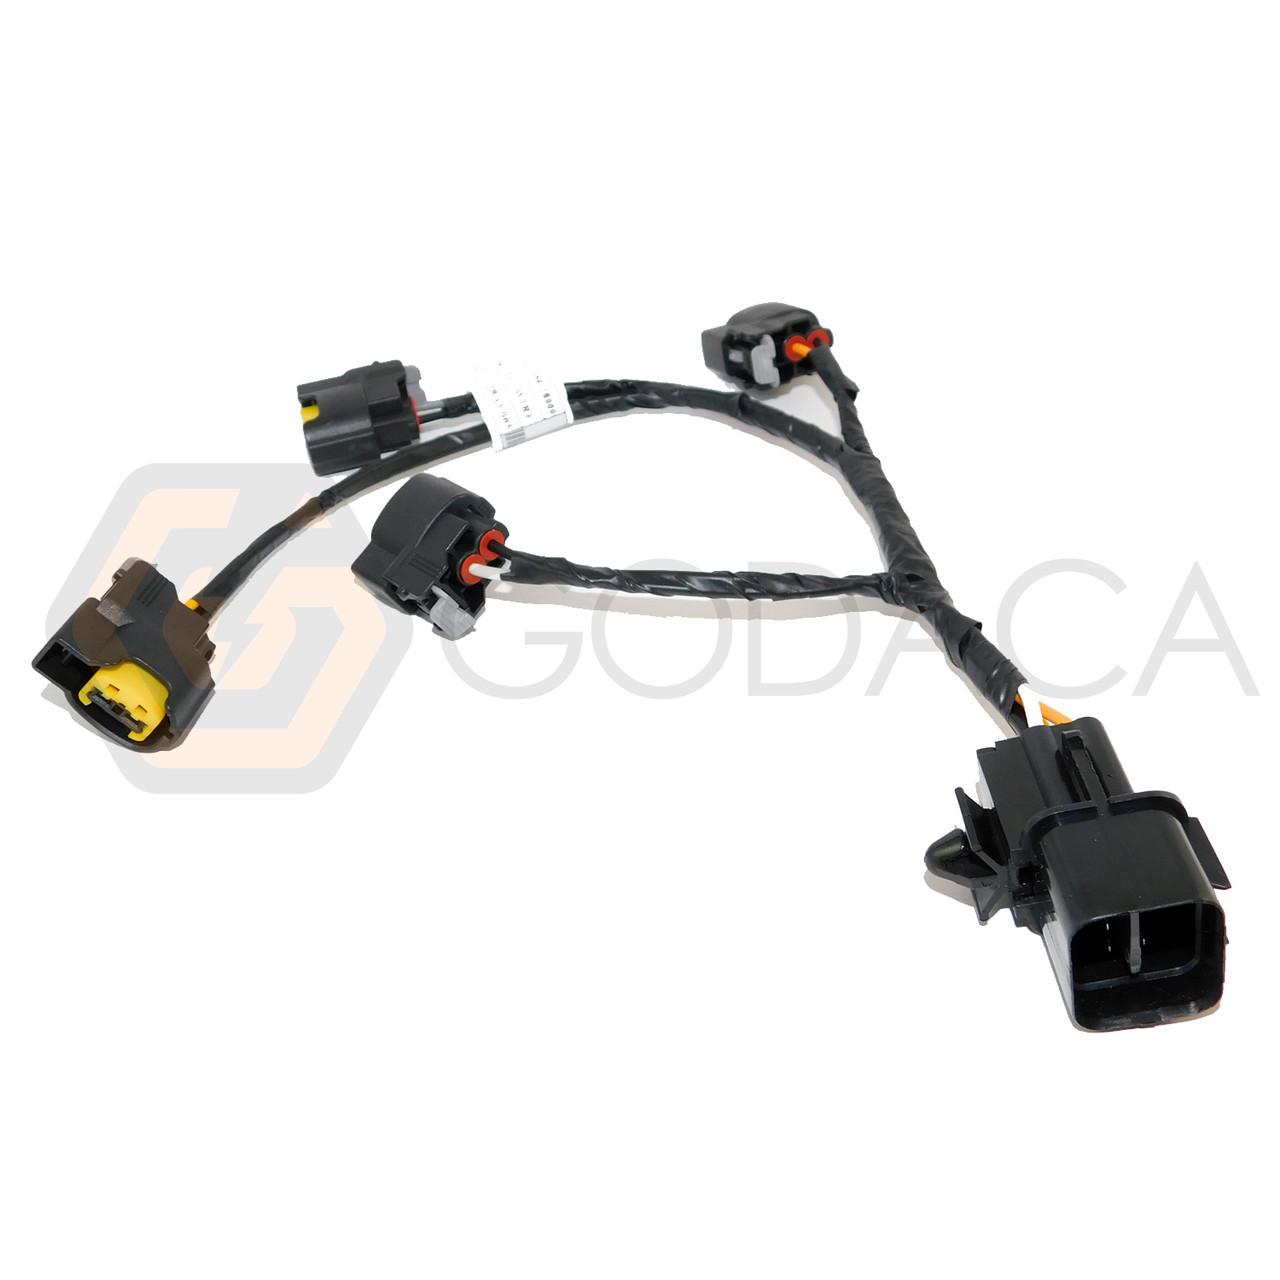 1x wiring harness for hyundai kia ignition coil 27350 2b000 Auto Wire Harness Repair